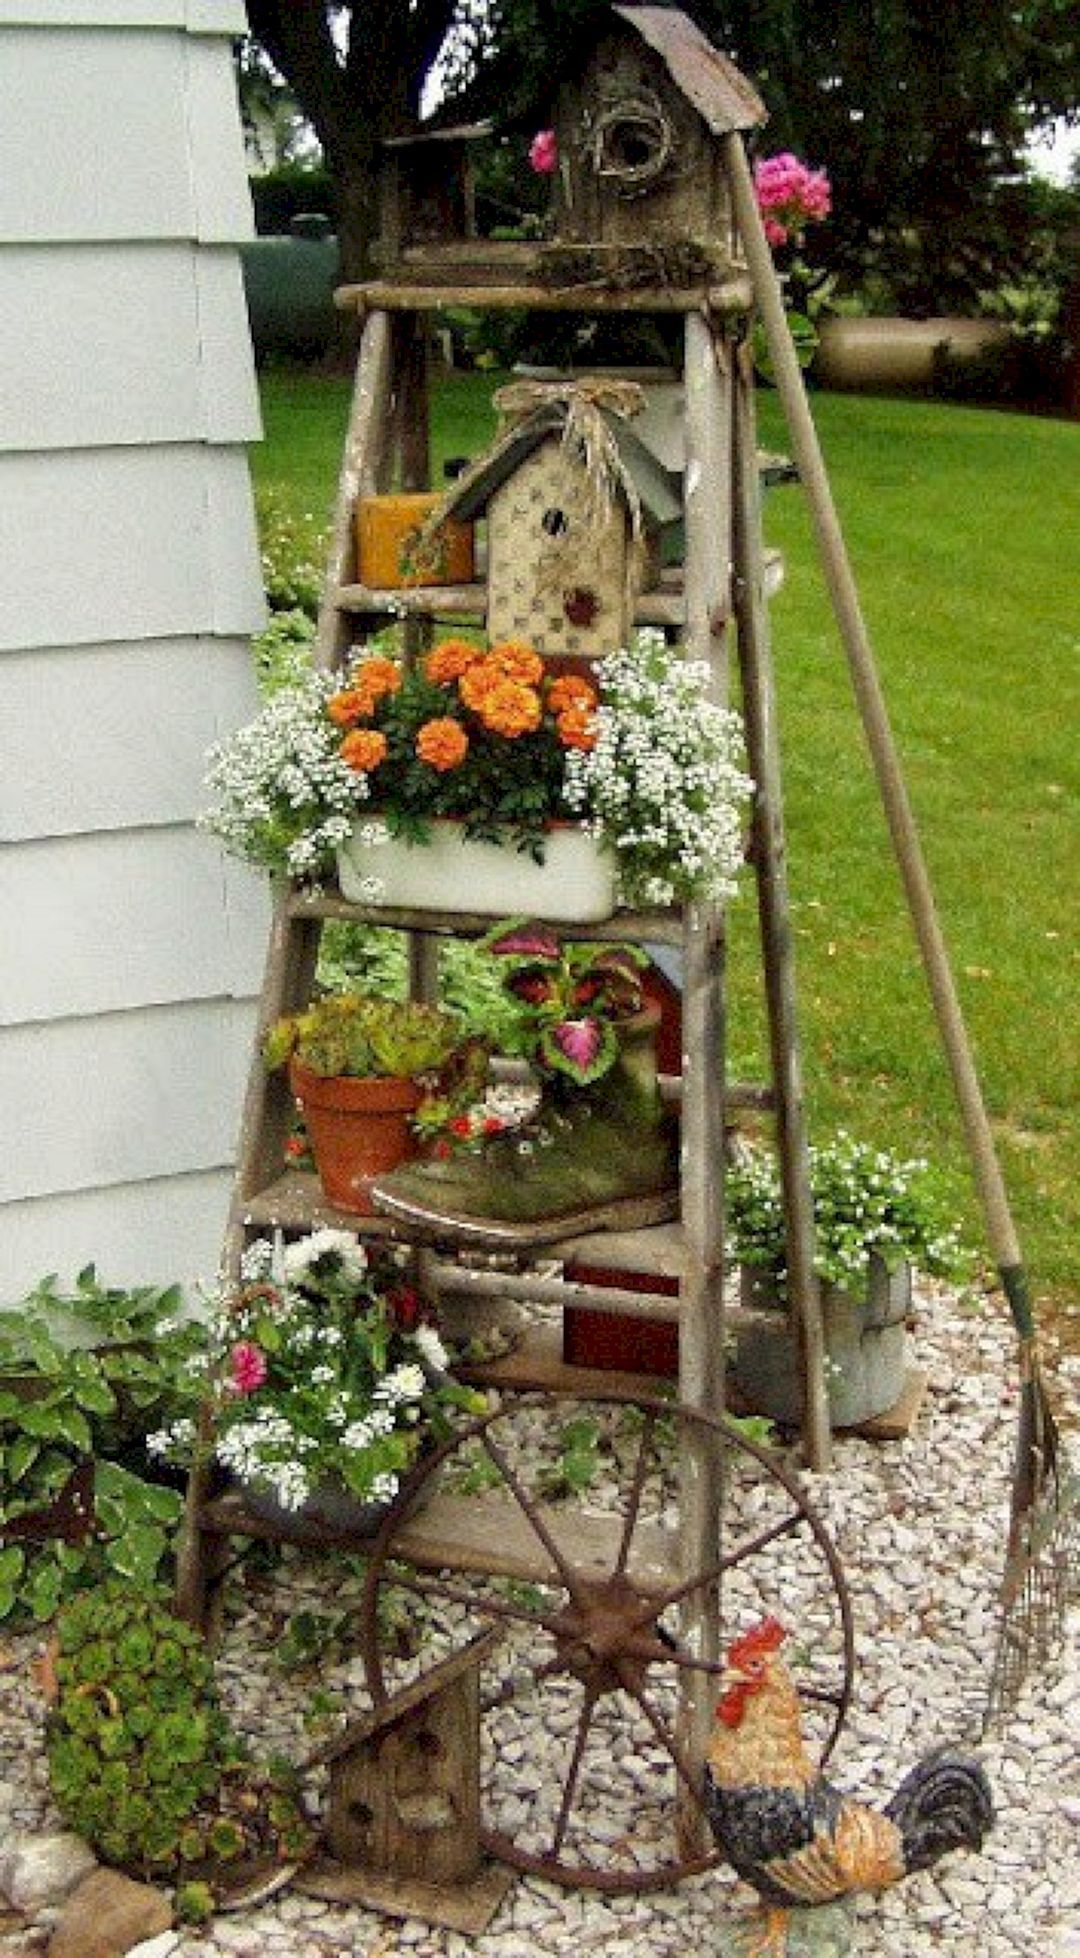 8 Brilliant DIY Vintage and Rustic Garden Decor Ideas on A ...